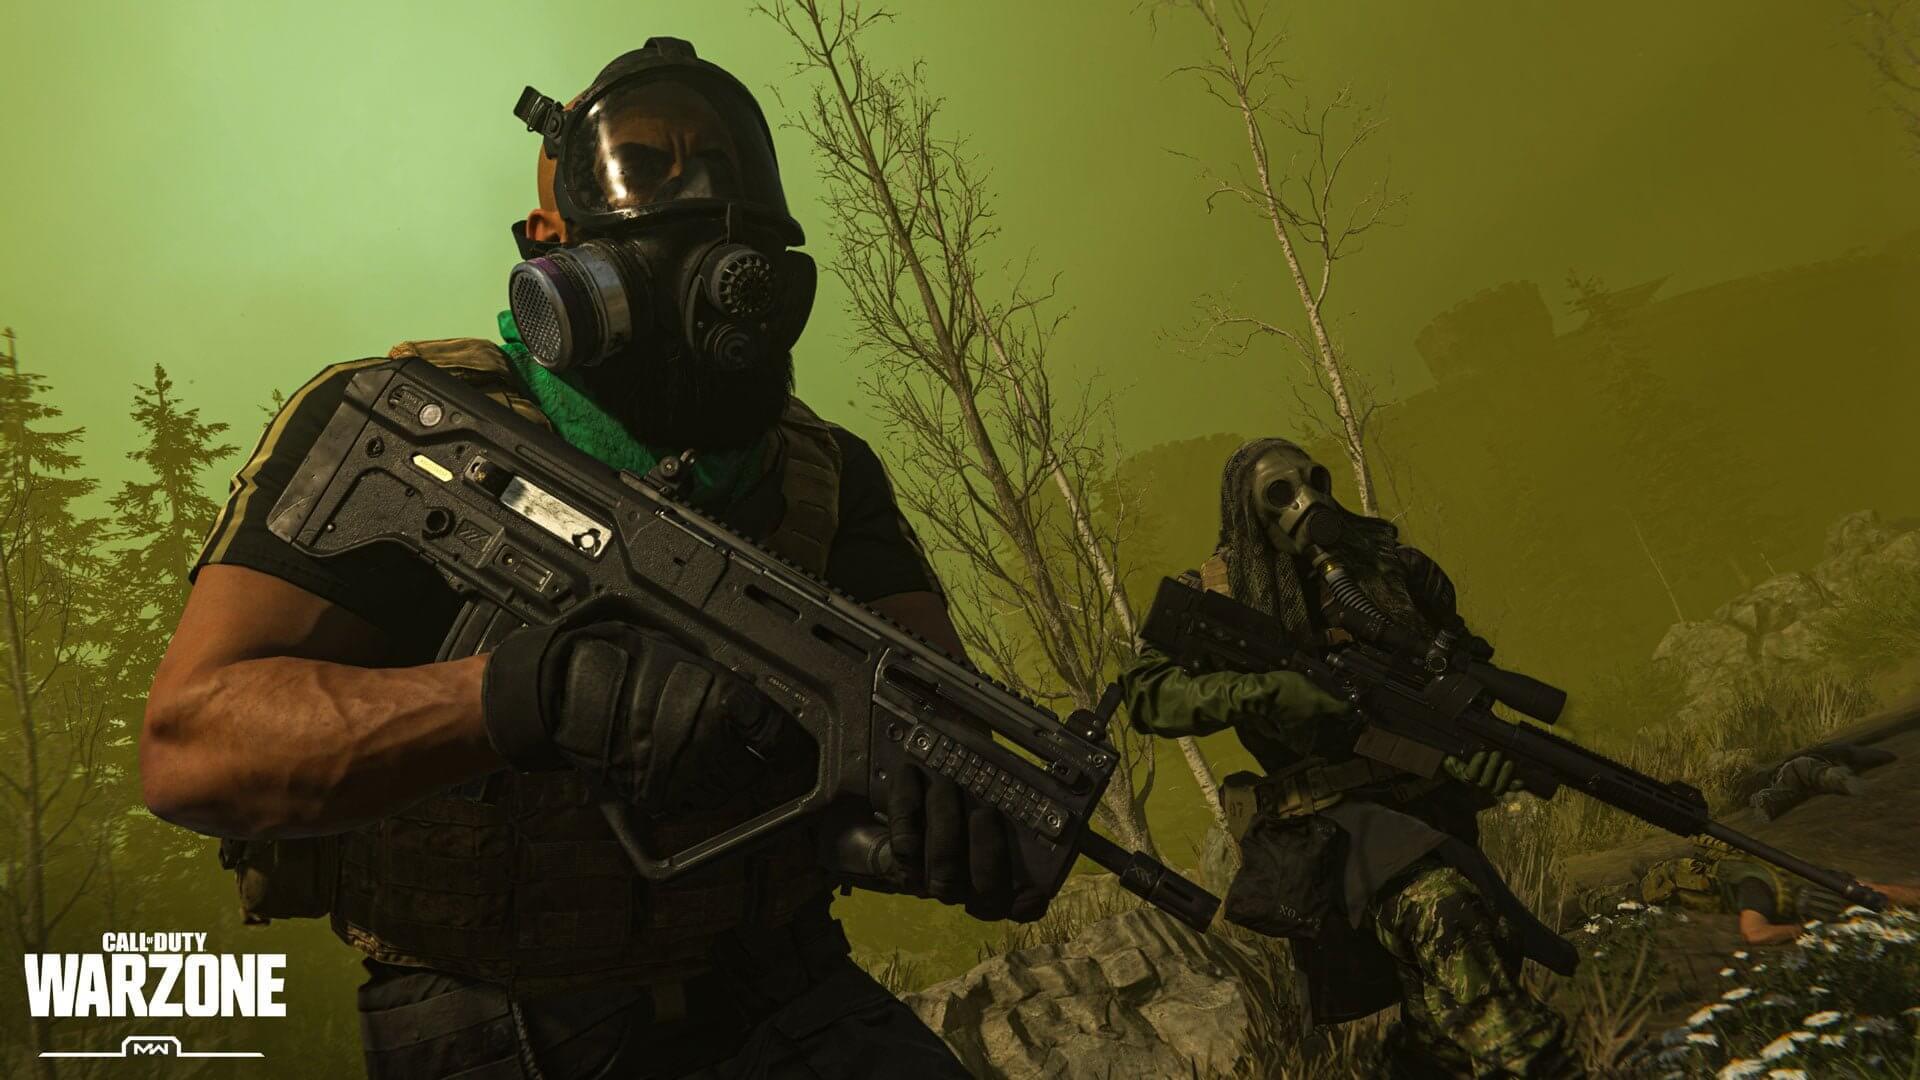 Call of Duty: Warzone İnceleme | Sistem | İndirme Linkleri 2021 4